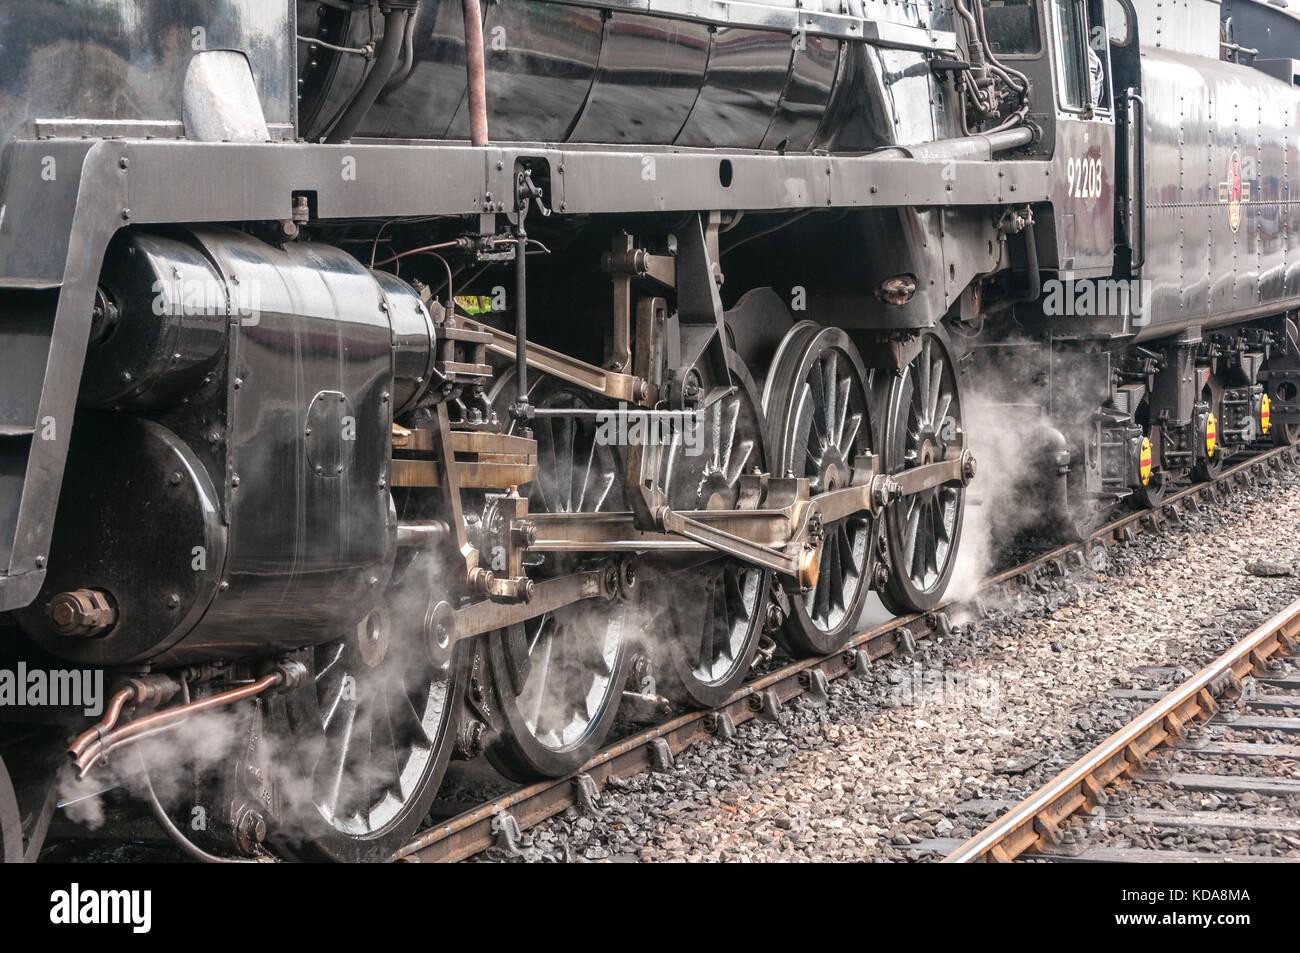 how to drive a train engine